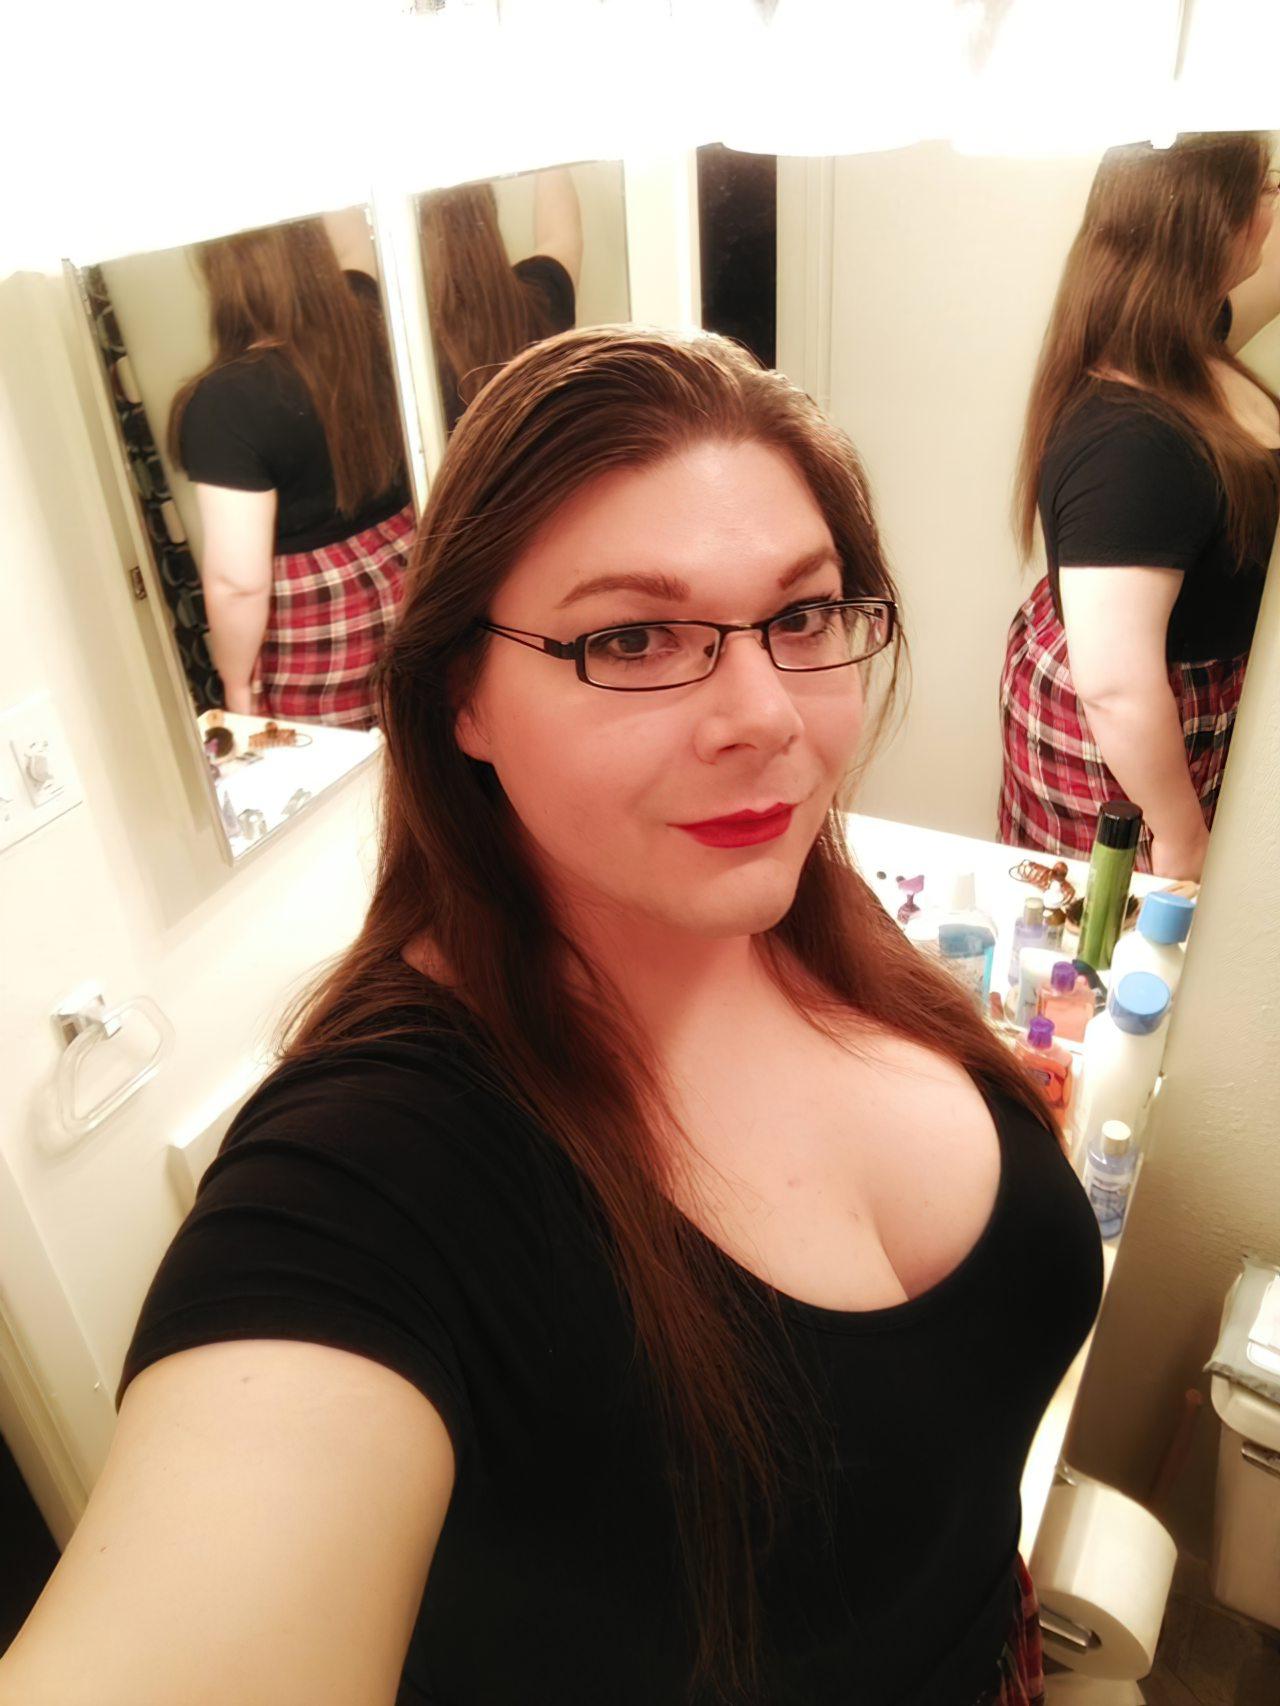 Travesti Gordinha (18)